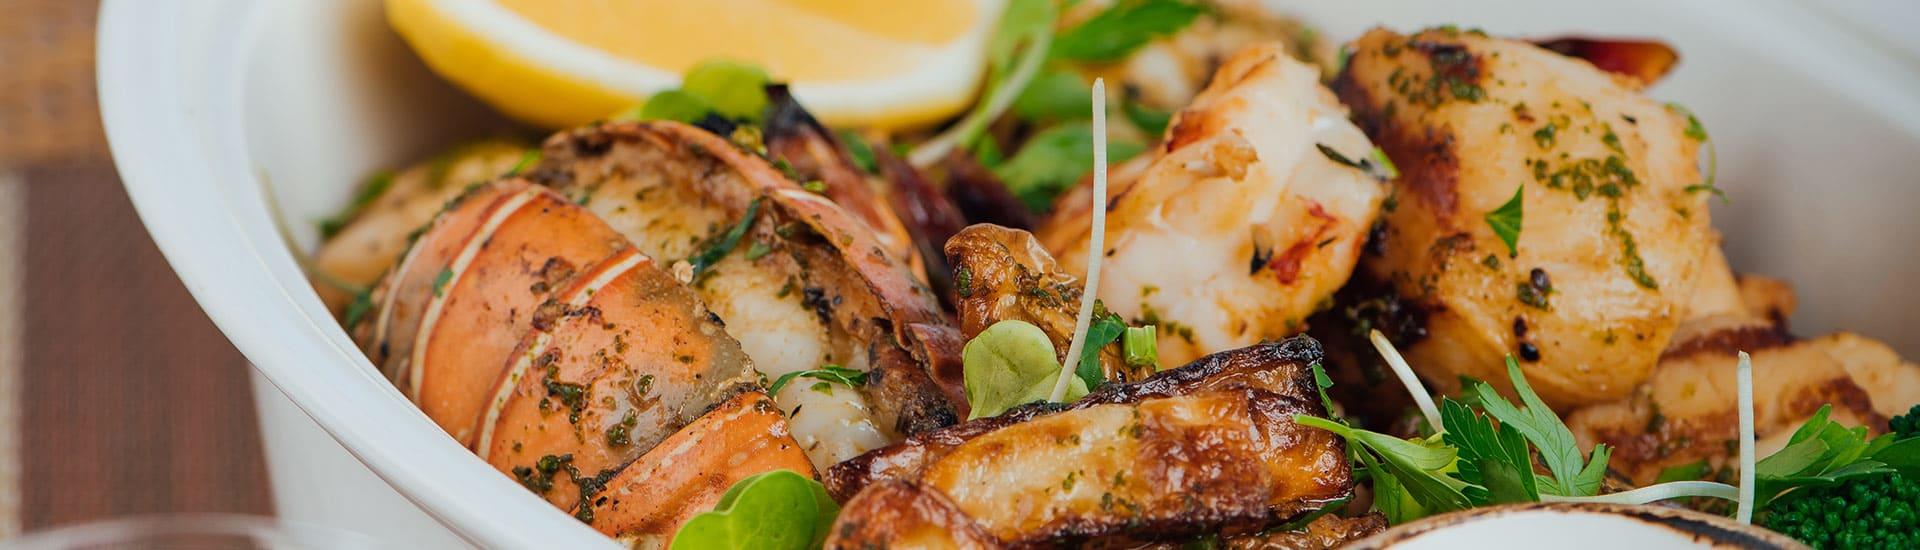 Delicious Seafood Cuisine at Al Mina Restaurant of Anantara Oman